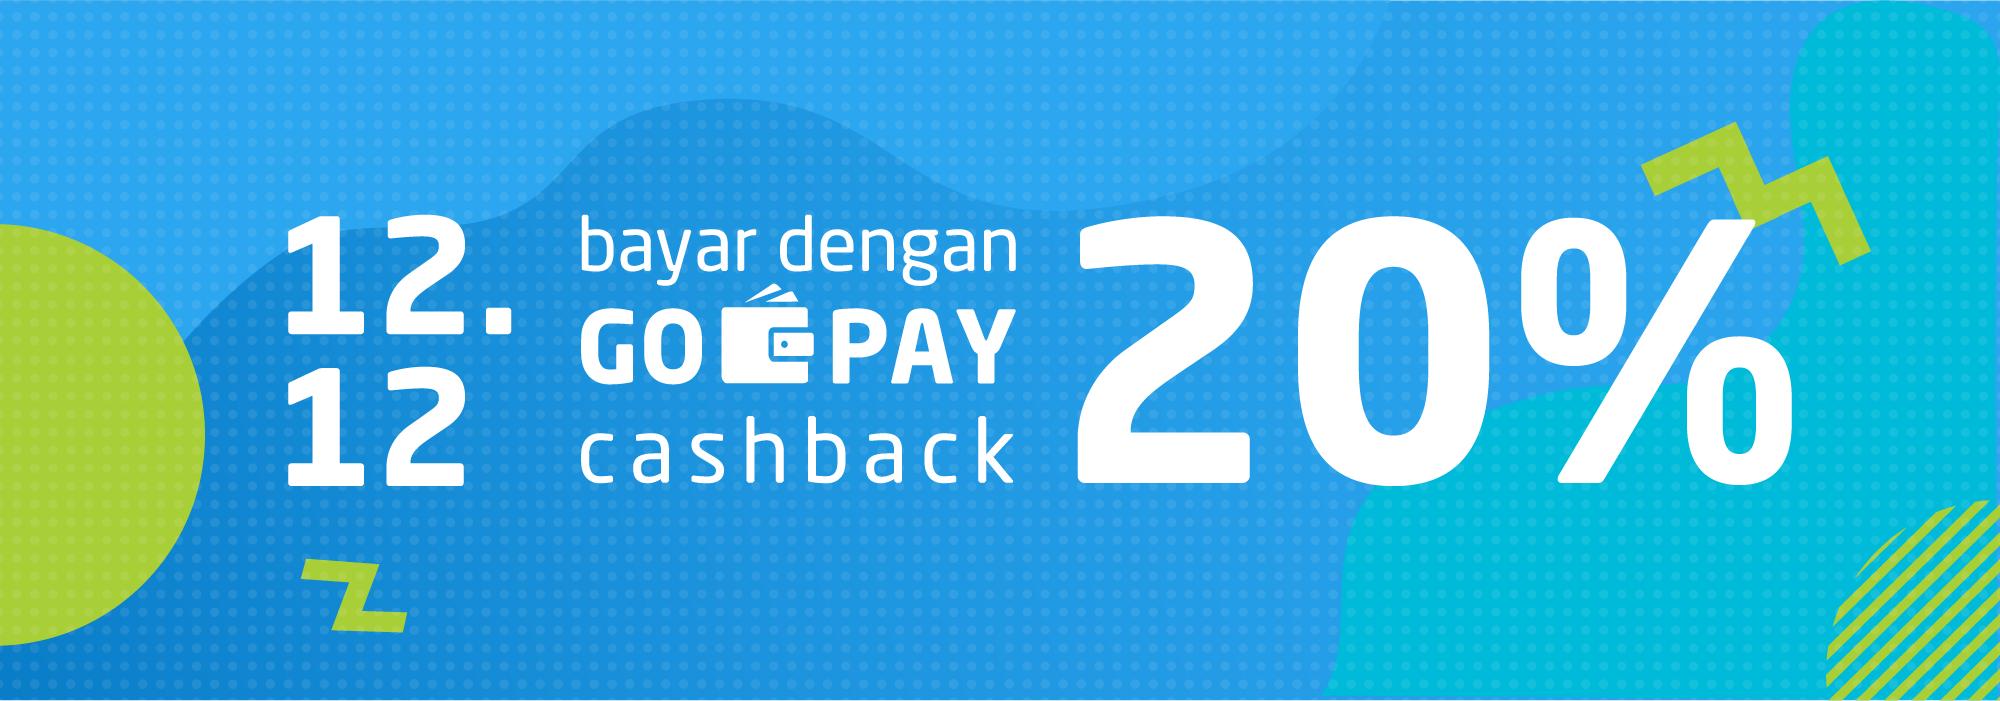 Promo Belanja Online Desember 2018: Pesta 12.12 Cashback 20%